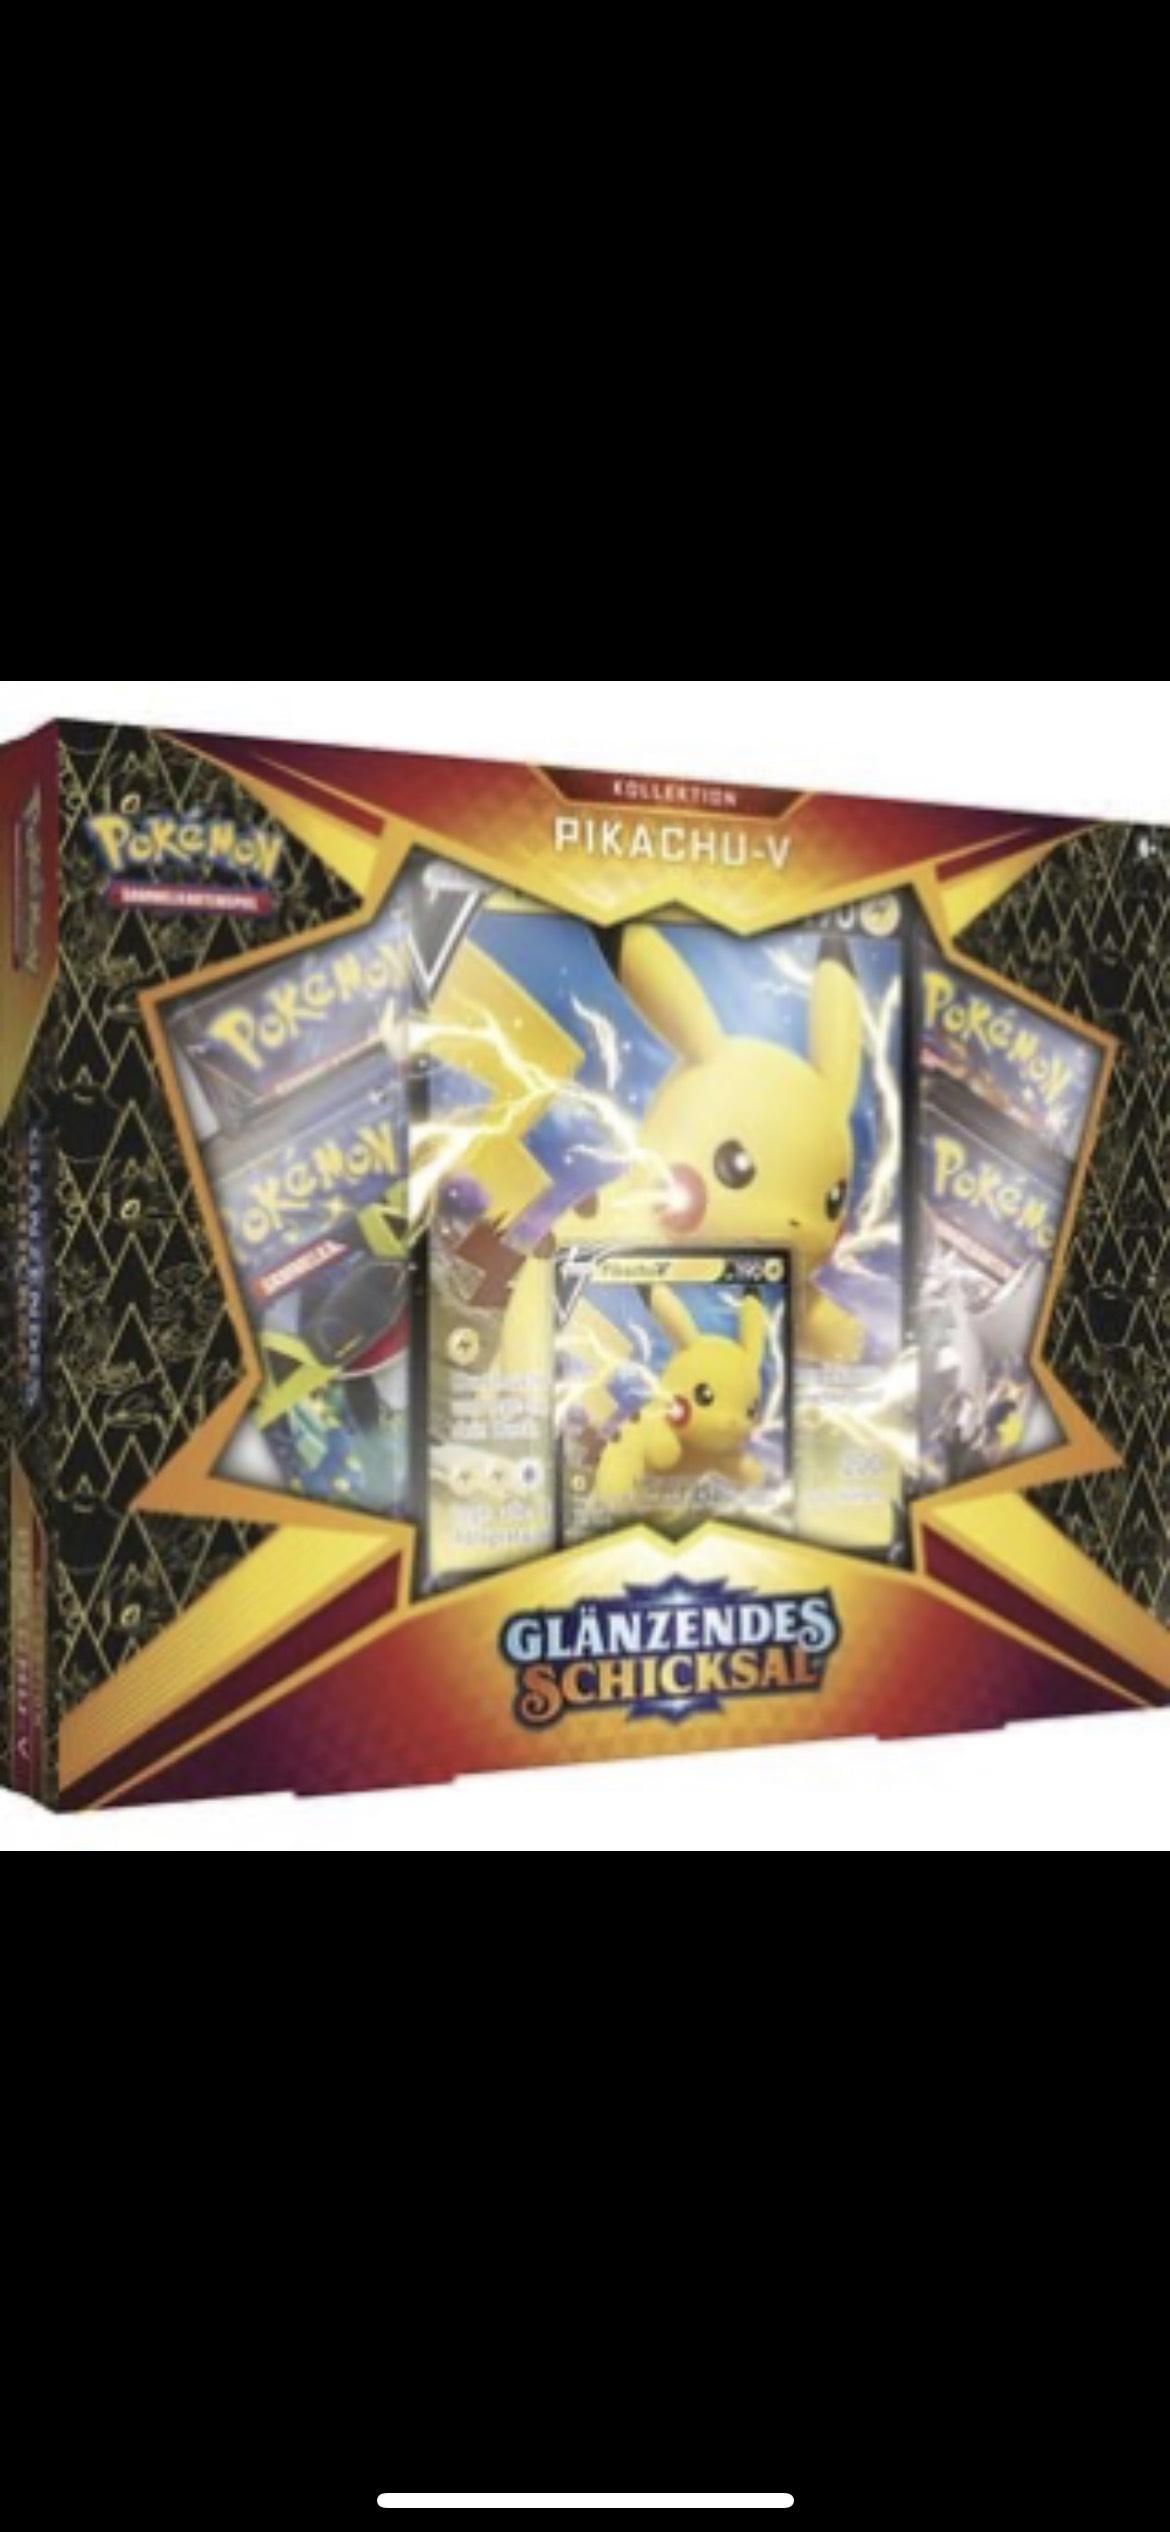 (Vorbestellung) Pokémon POK80869 TCG Shining Fates Pikachu V Box